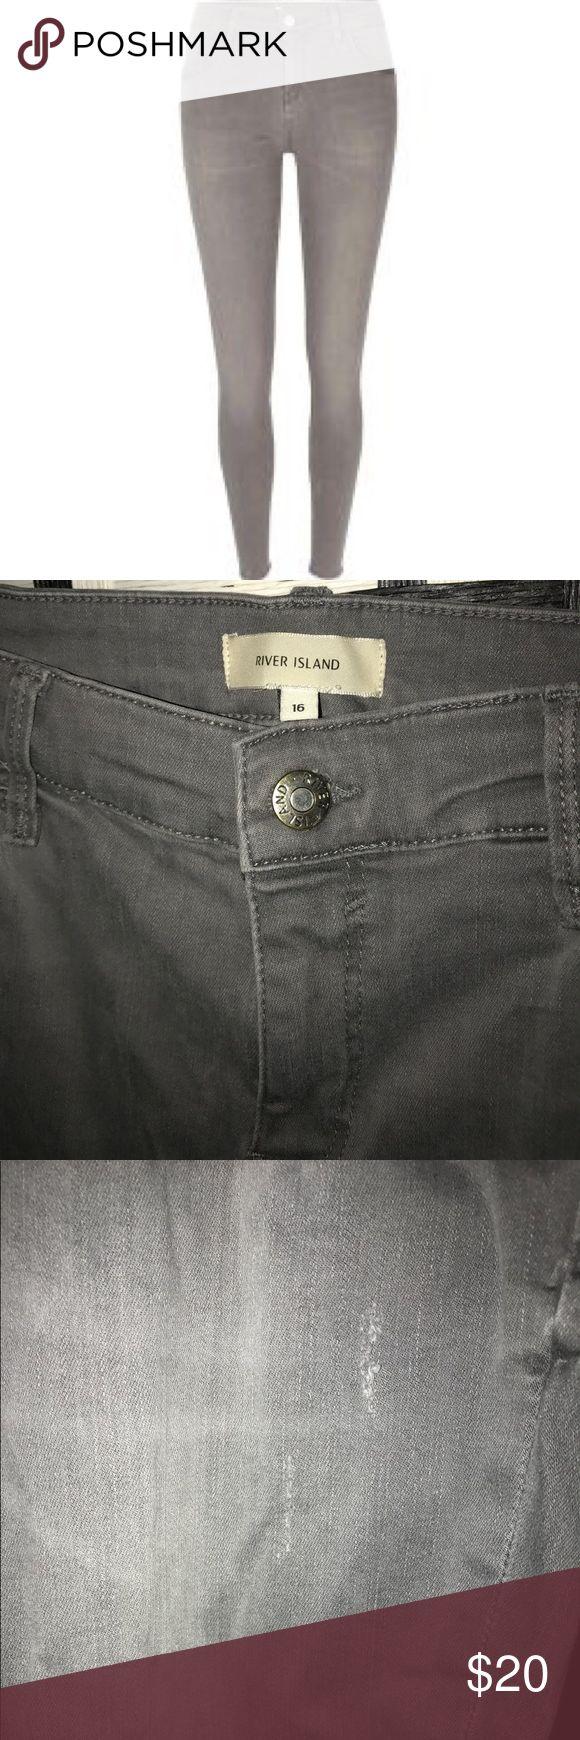 River island grey super skinny jeans Gently used river island Amelie light grey super skinny jeans. Slightly tattered style. UK size 16. SHORT length (30 inches) River Island Jeans Skinny